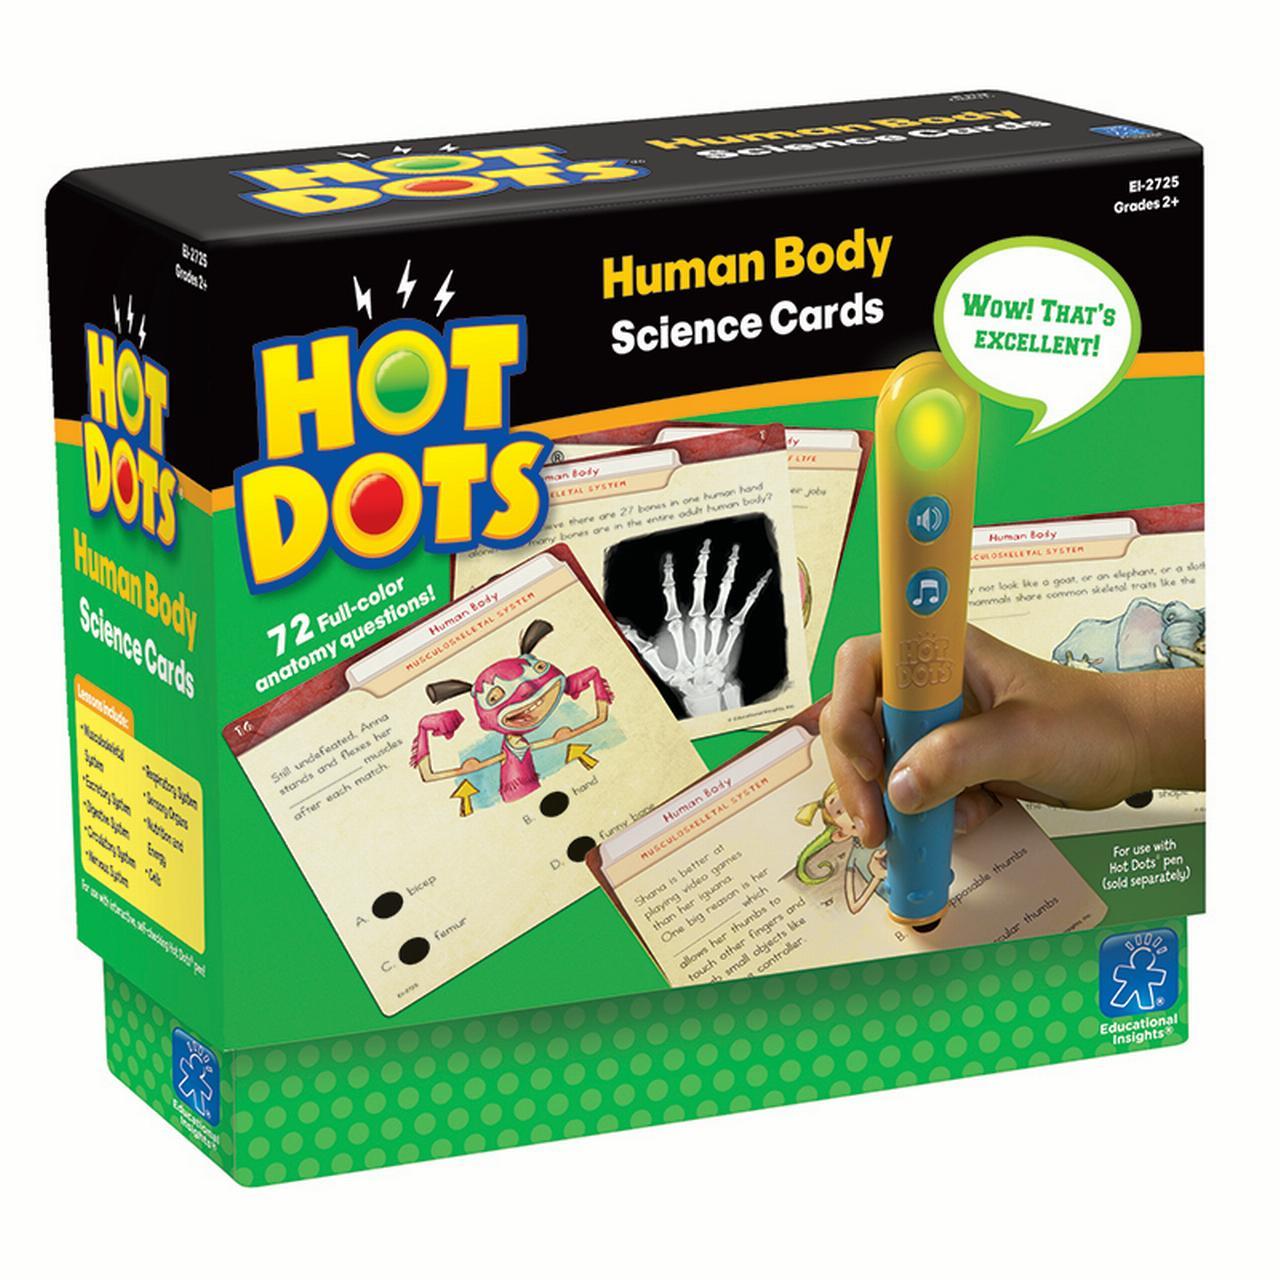 HOT DOTS SCIENCE SET HUMAN BODY